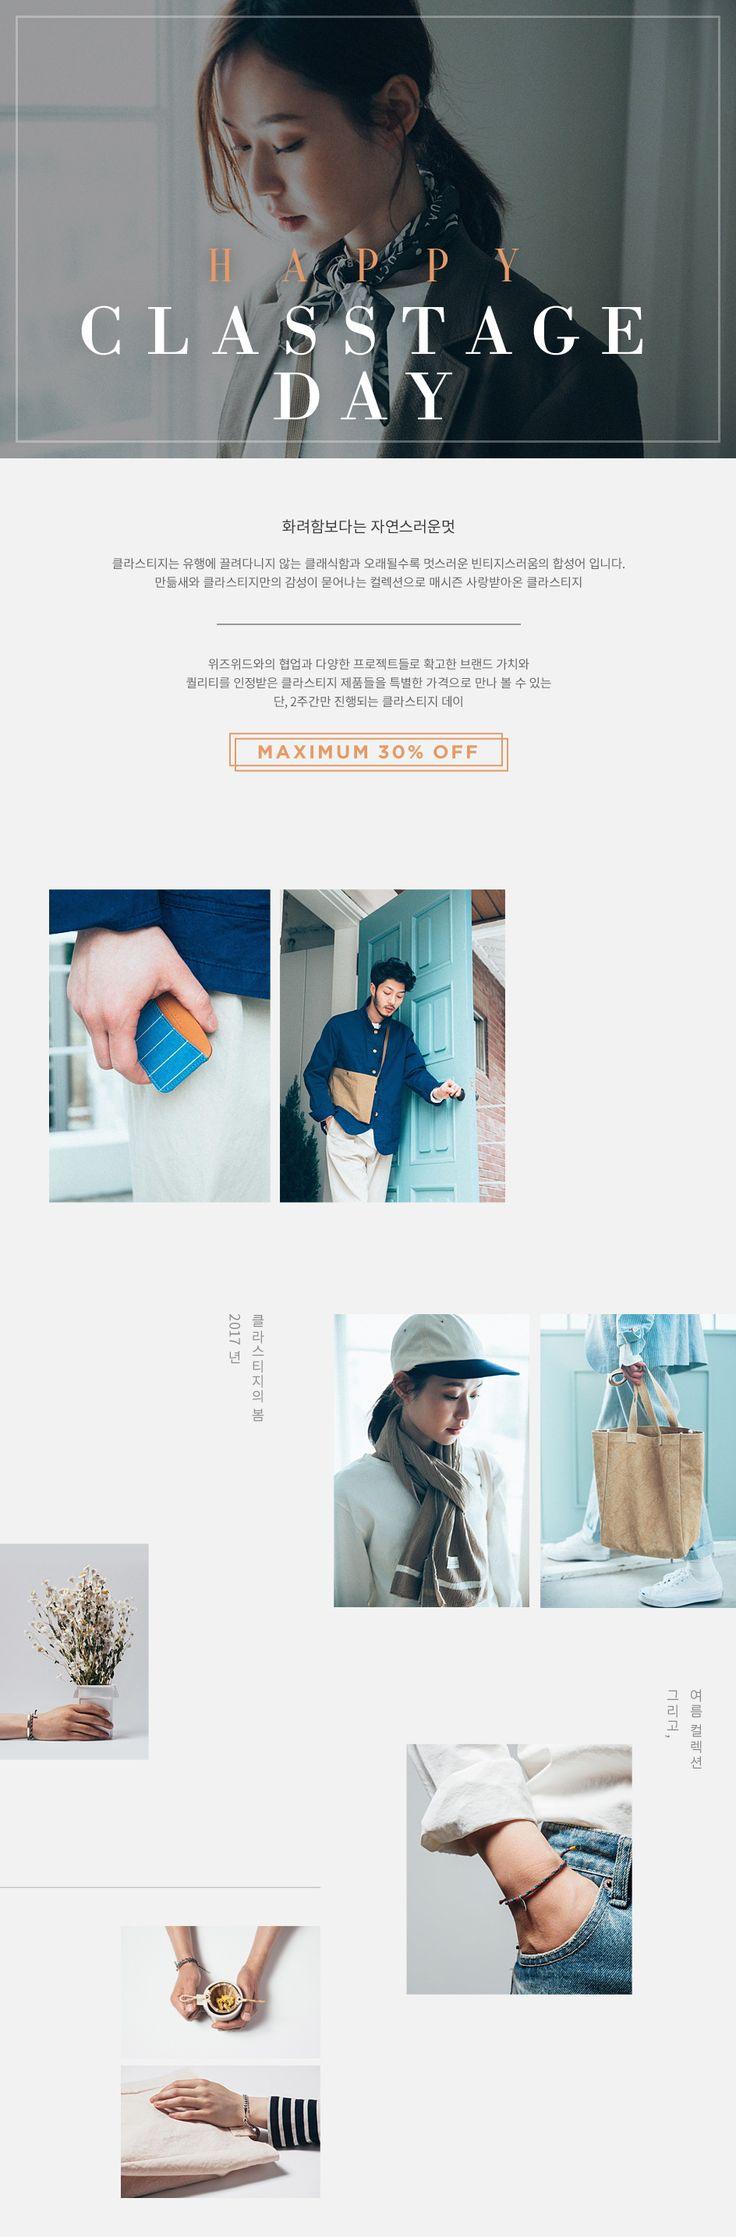 WIZWID:위즈위드 - 글로벌 쇼핑 네트워크 여성 남성 의류 우먼 맨 패션 기획전 CLASSTAGE DAY 단, 2주간만 진행하는 클라스티지 데이!